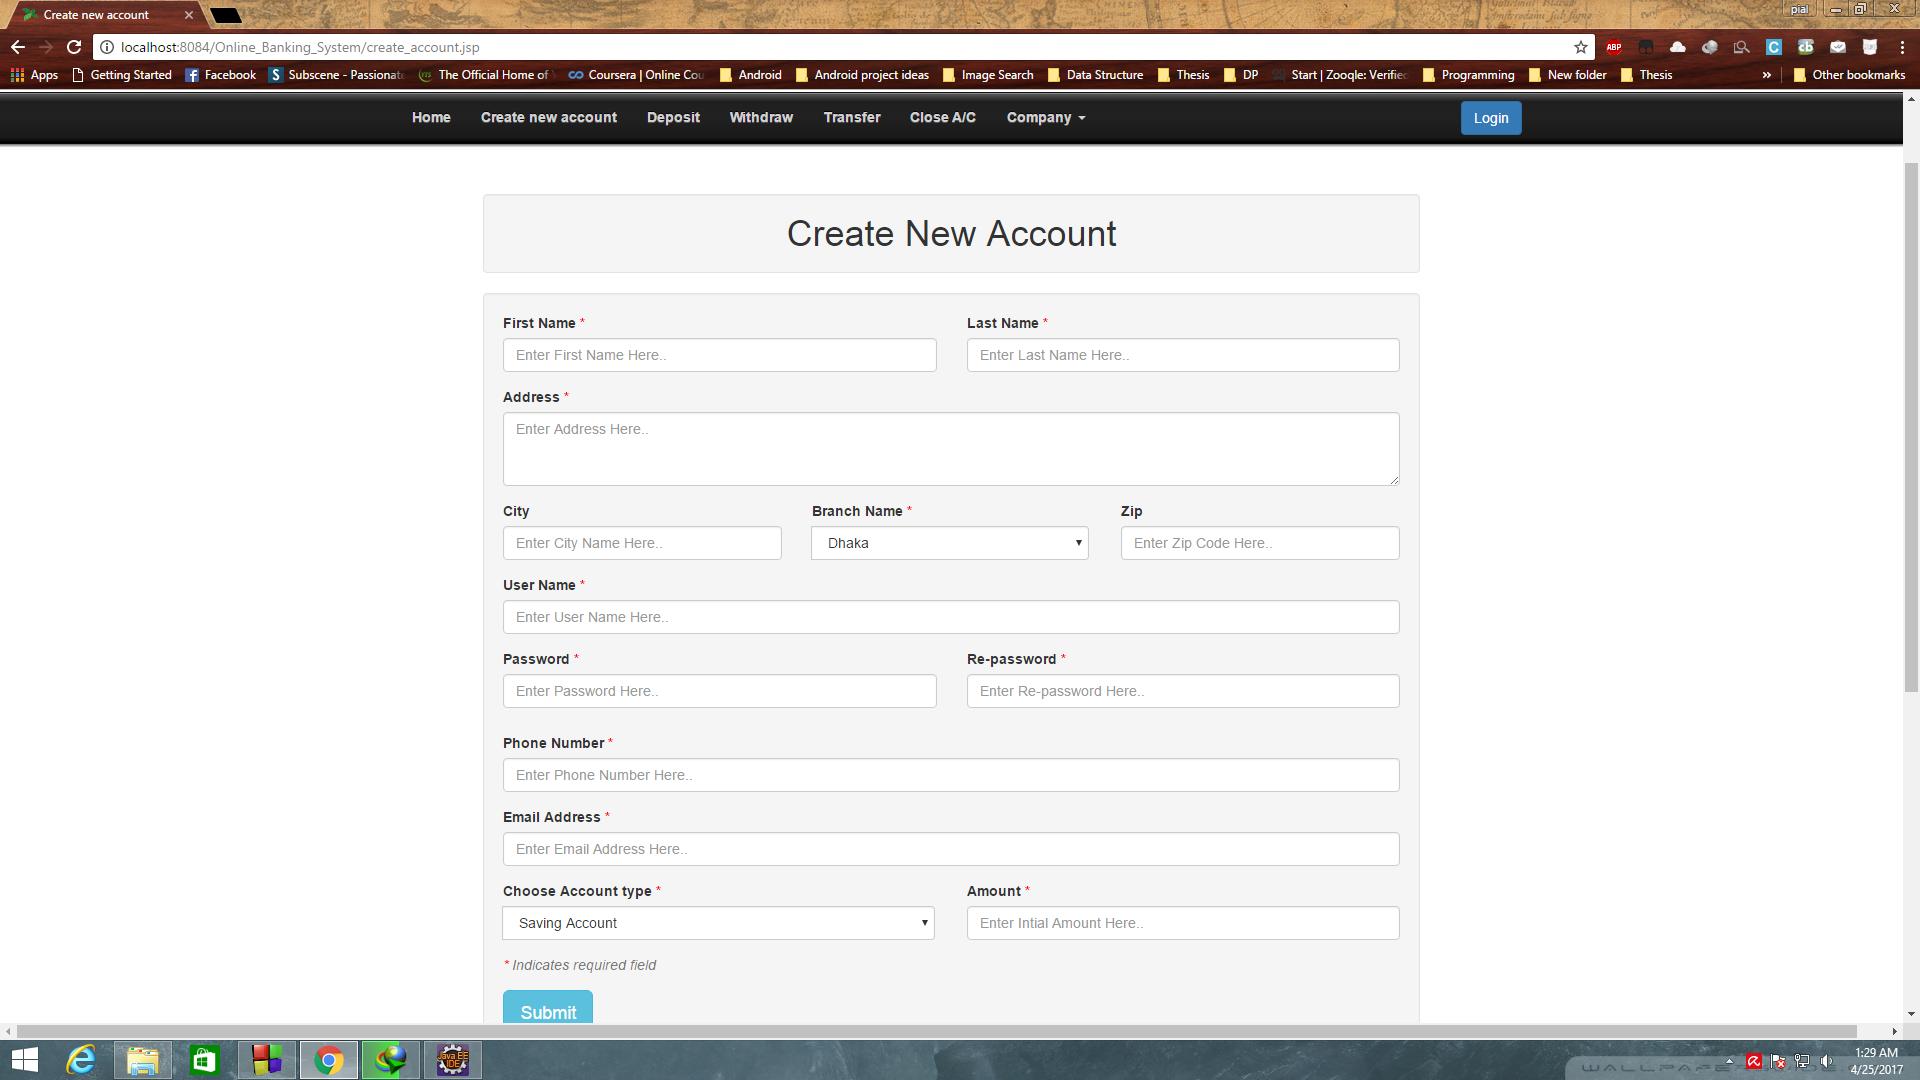 GitHub - PialKanti/Online-Banking-System: Java, J2EE based